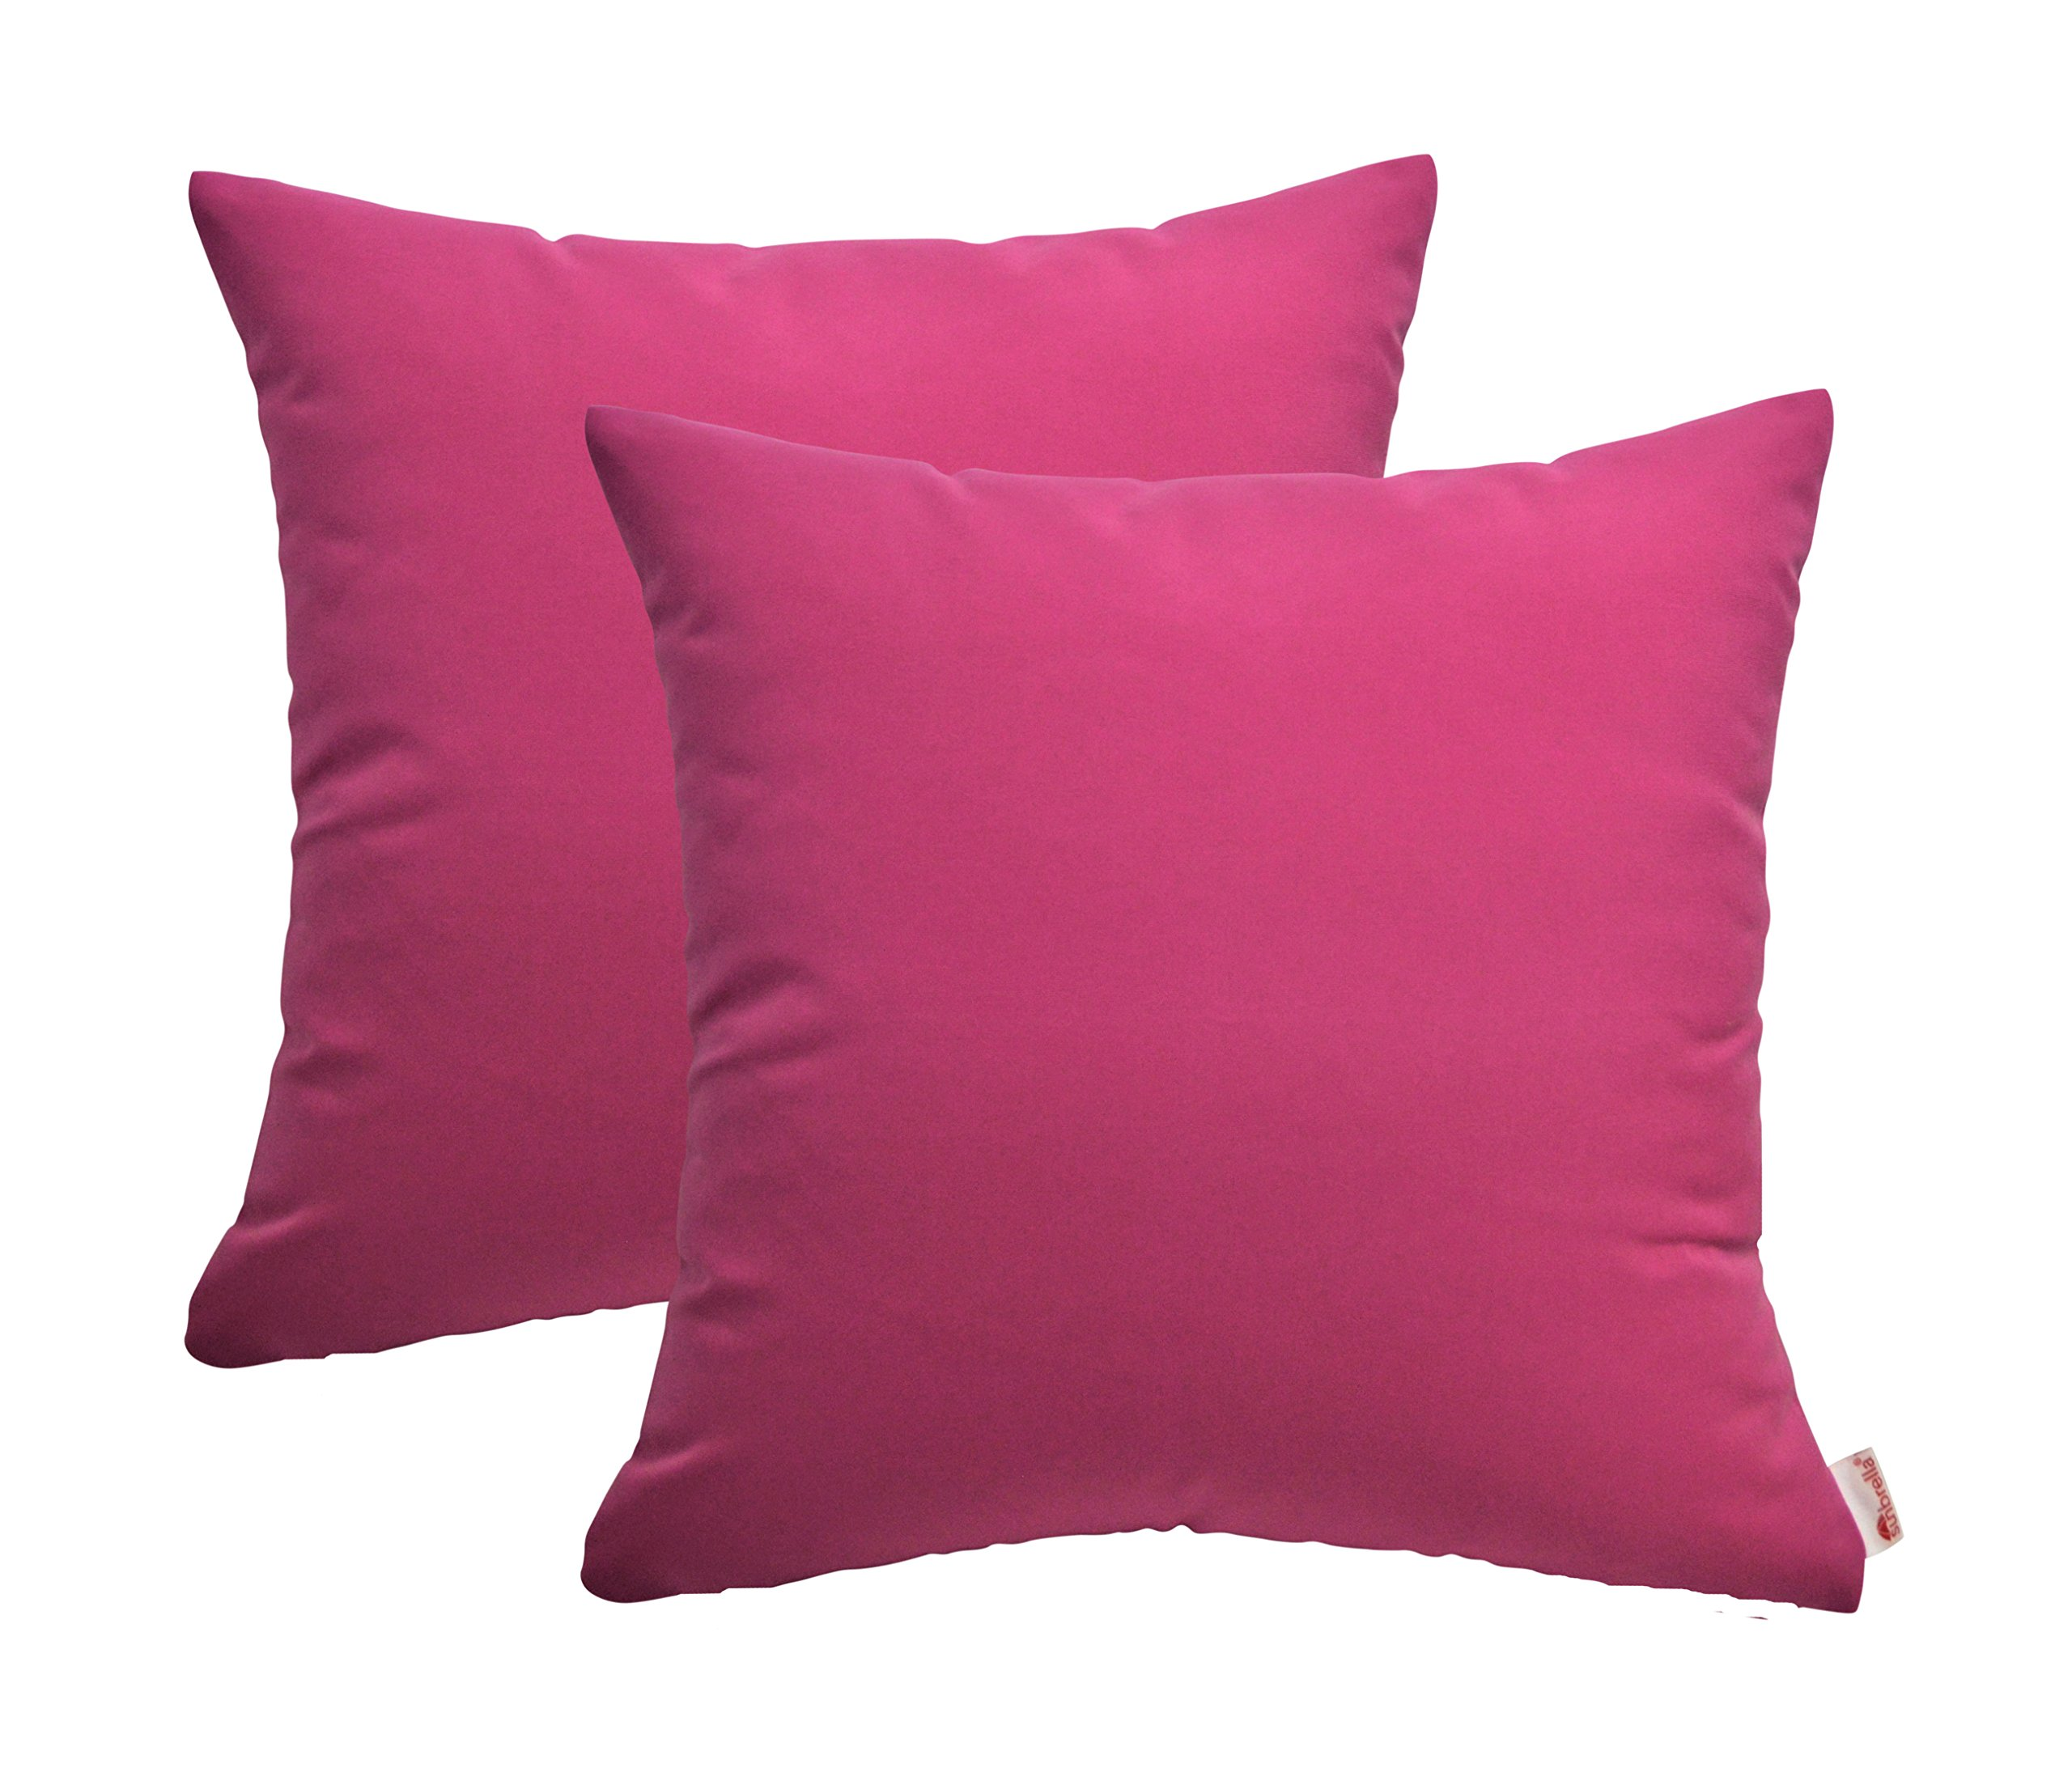 RSH Décor Set of 2 Indoor Outdoor Decorative Throw Pillows Sunbrella Canvas Hot Pink - Choose Size (17'' x 17'')